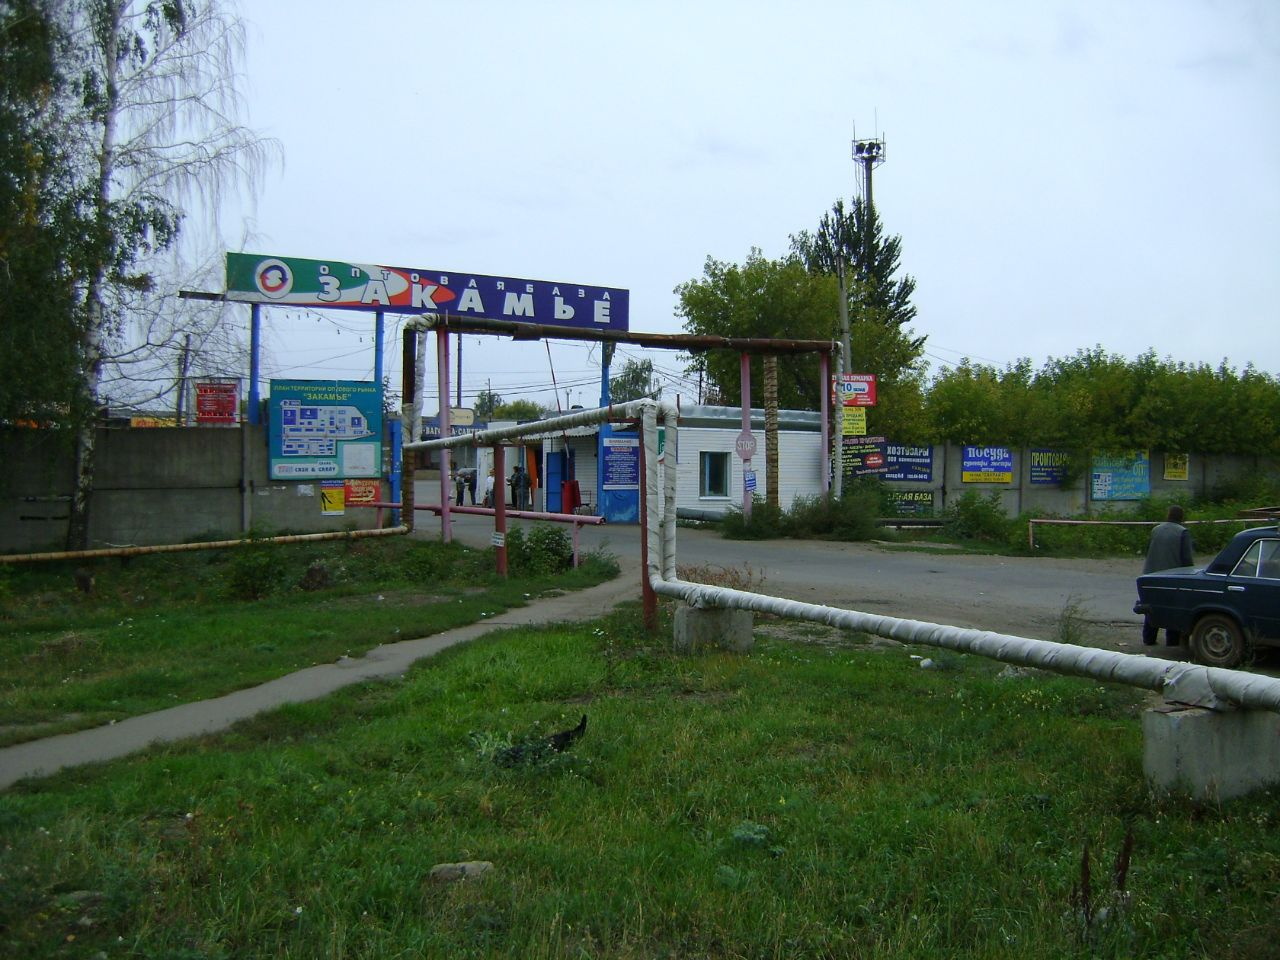 Складском комплексе Закамье